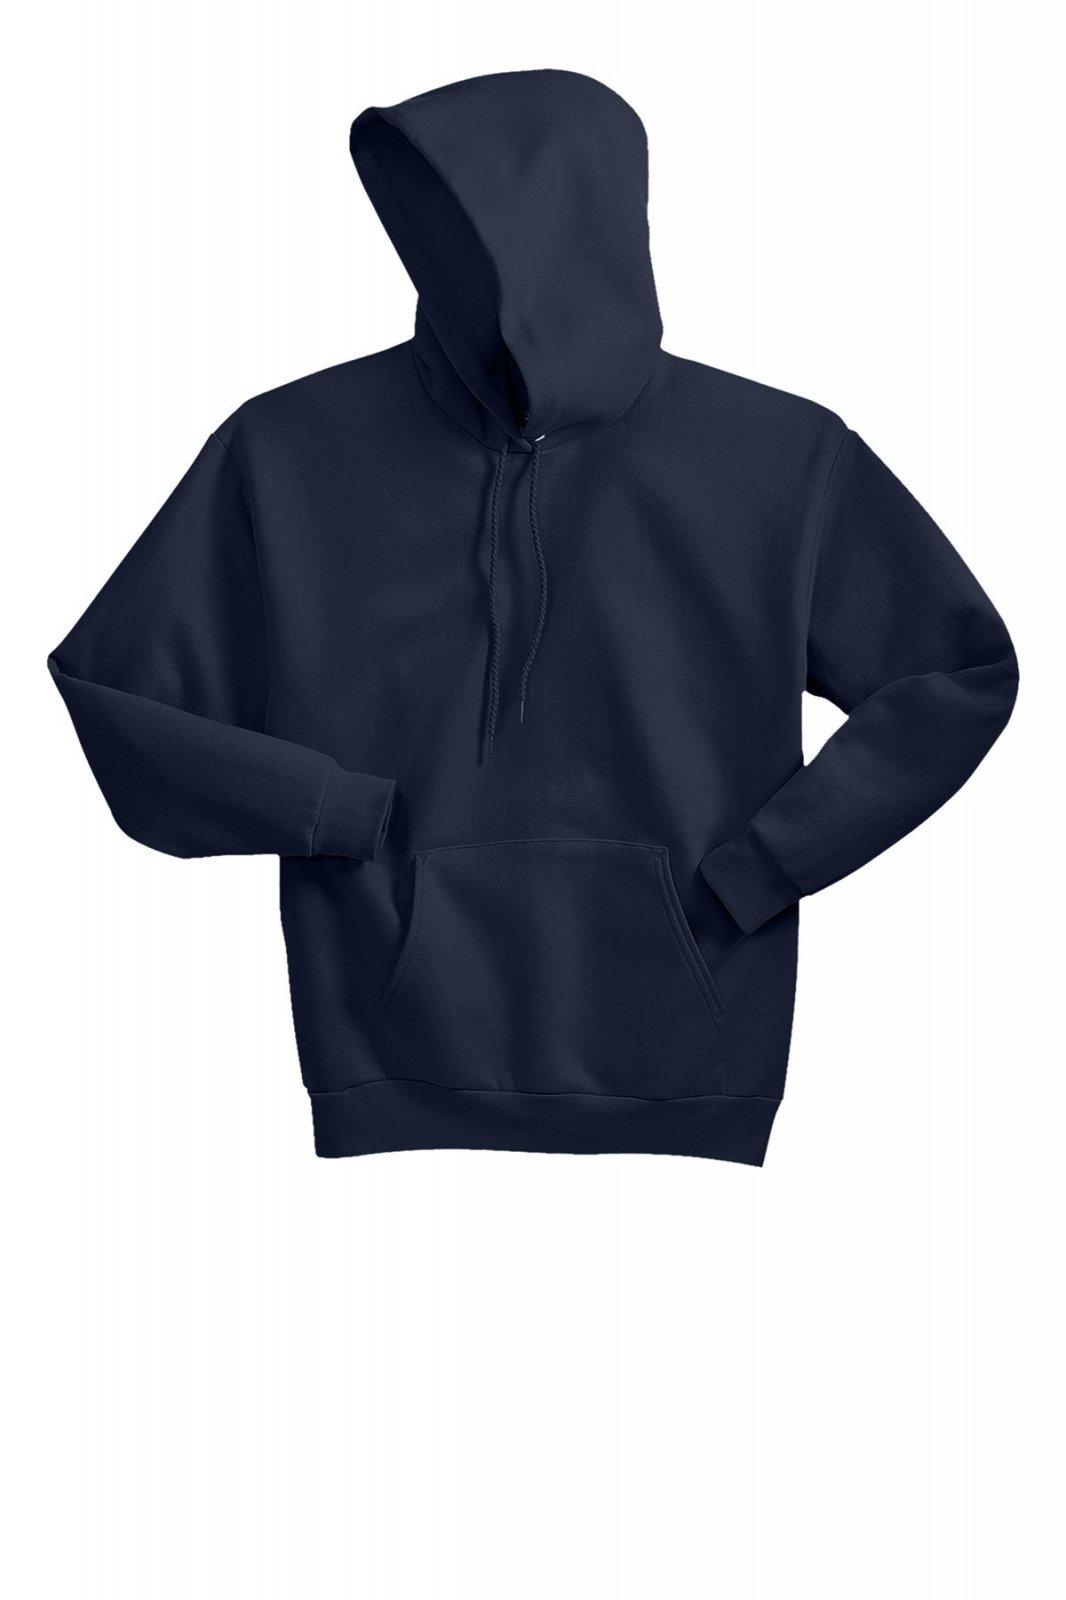 P170 Hanes EcoSmart Pullover Hooded Sweatshirt